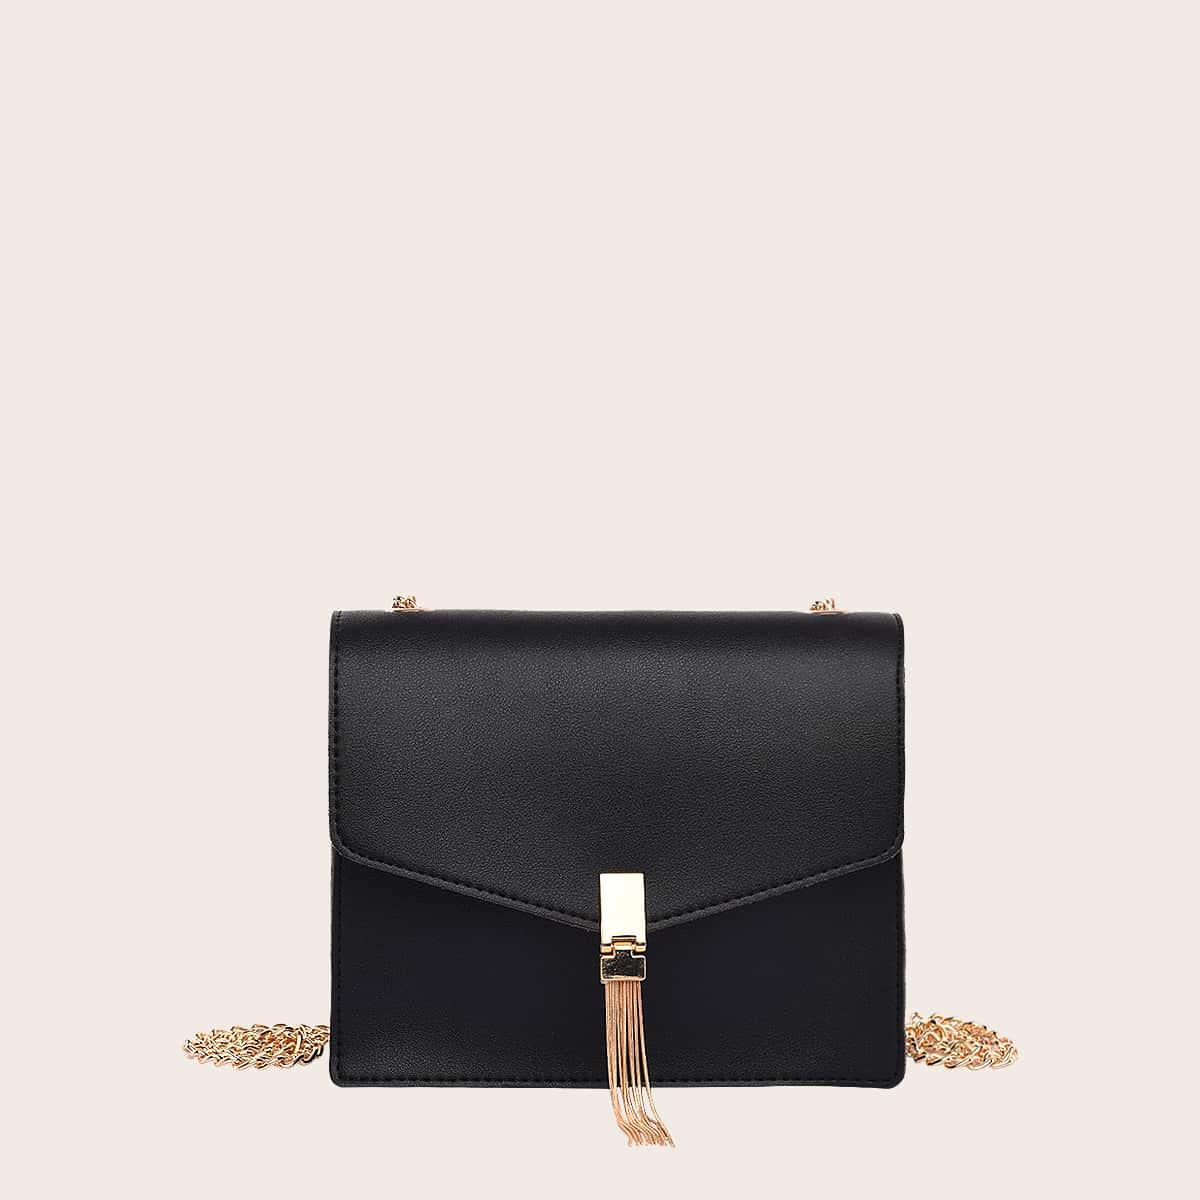 Квадратная сумка на цепочке с бахромой